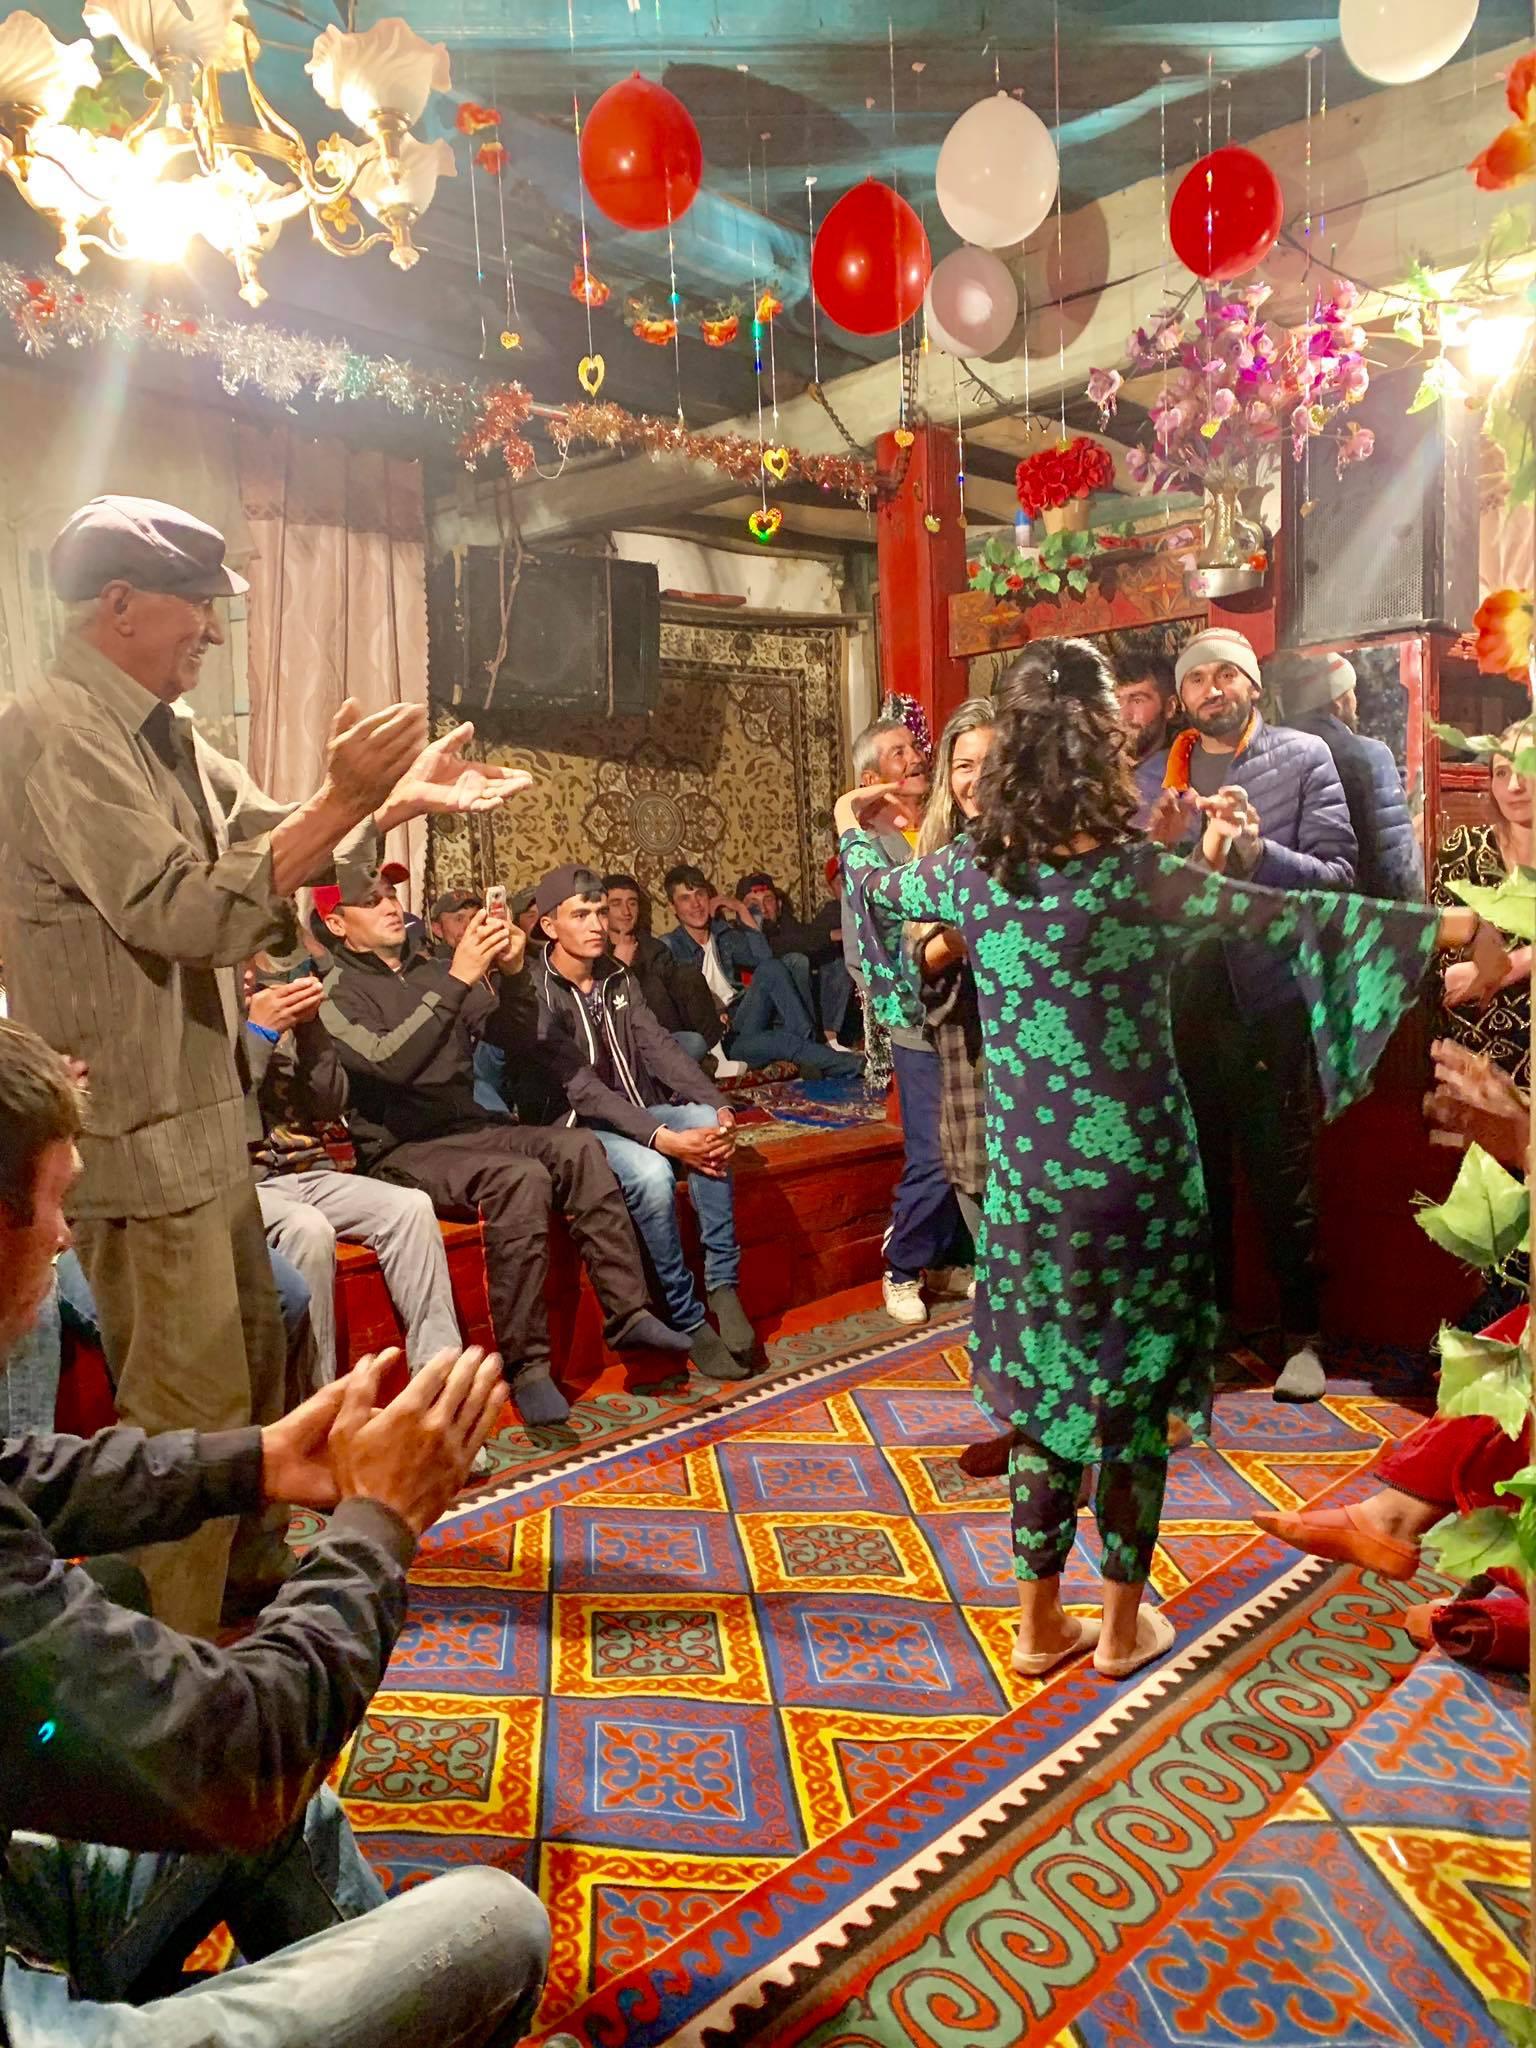 Kach Solo Travels in 2019 Experiencing a Traditional Wakhan Wedding in Tajikistan11.jpg